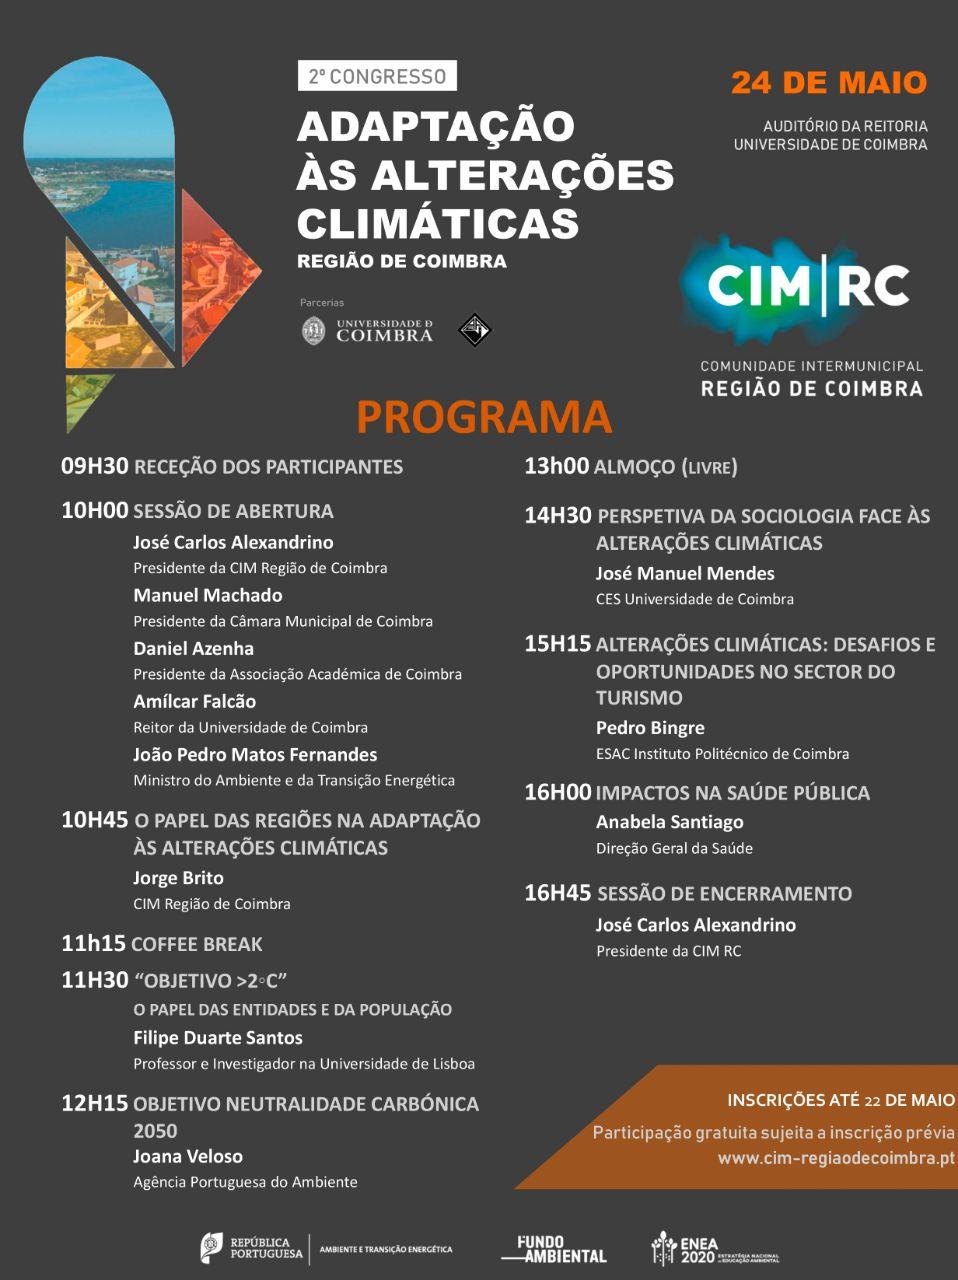 Microsoft PowerPoint - Congresso-AAClimaticas-CIMRC-16maio.pptx